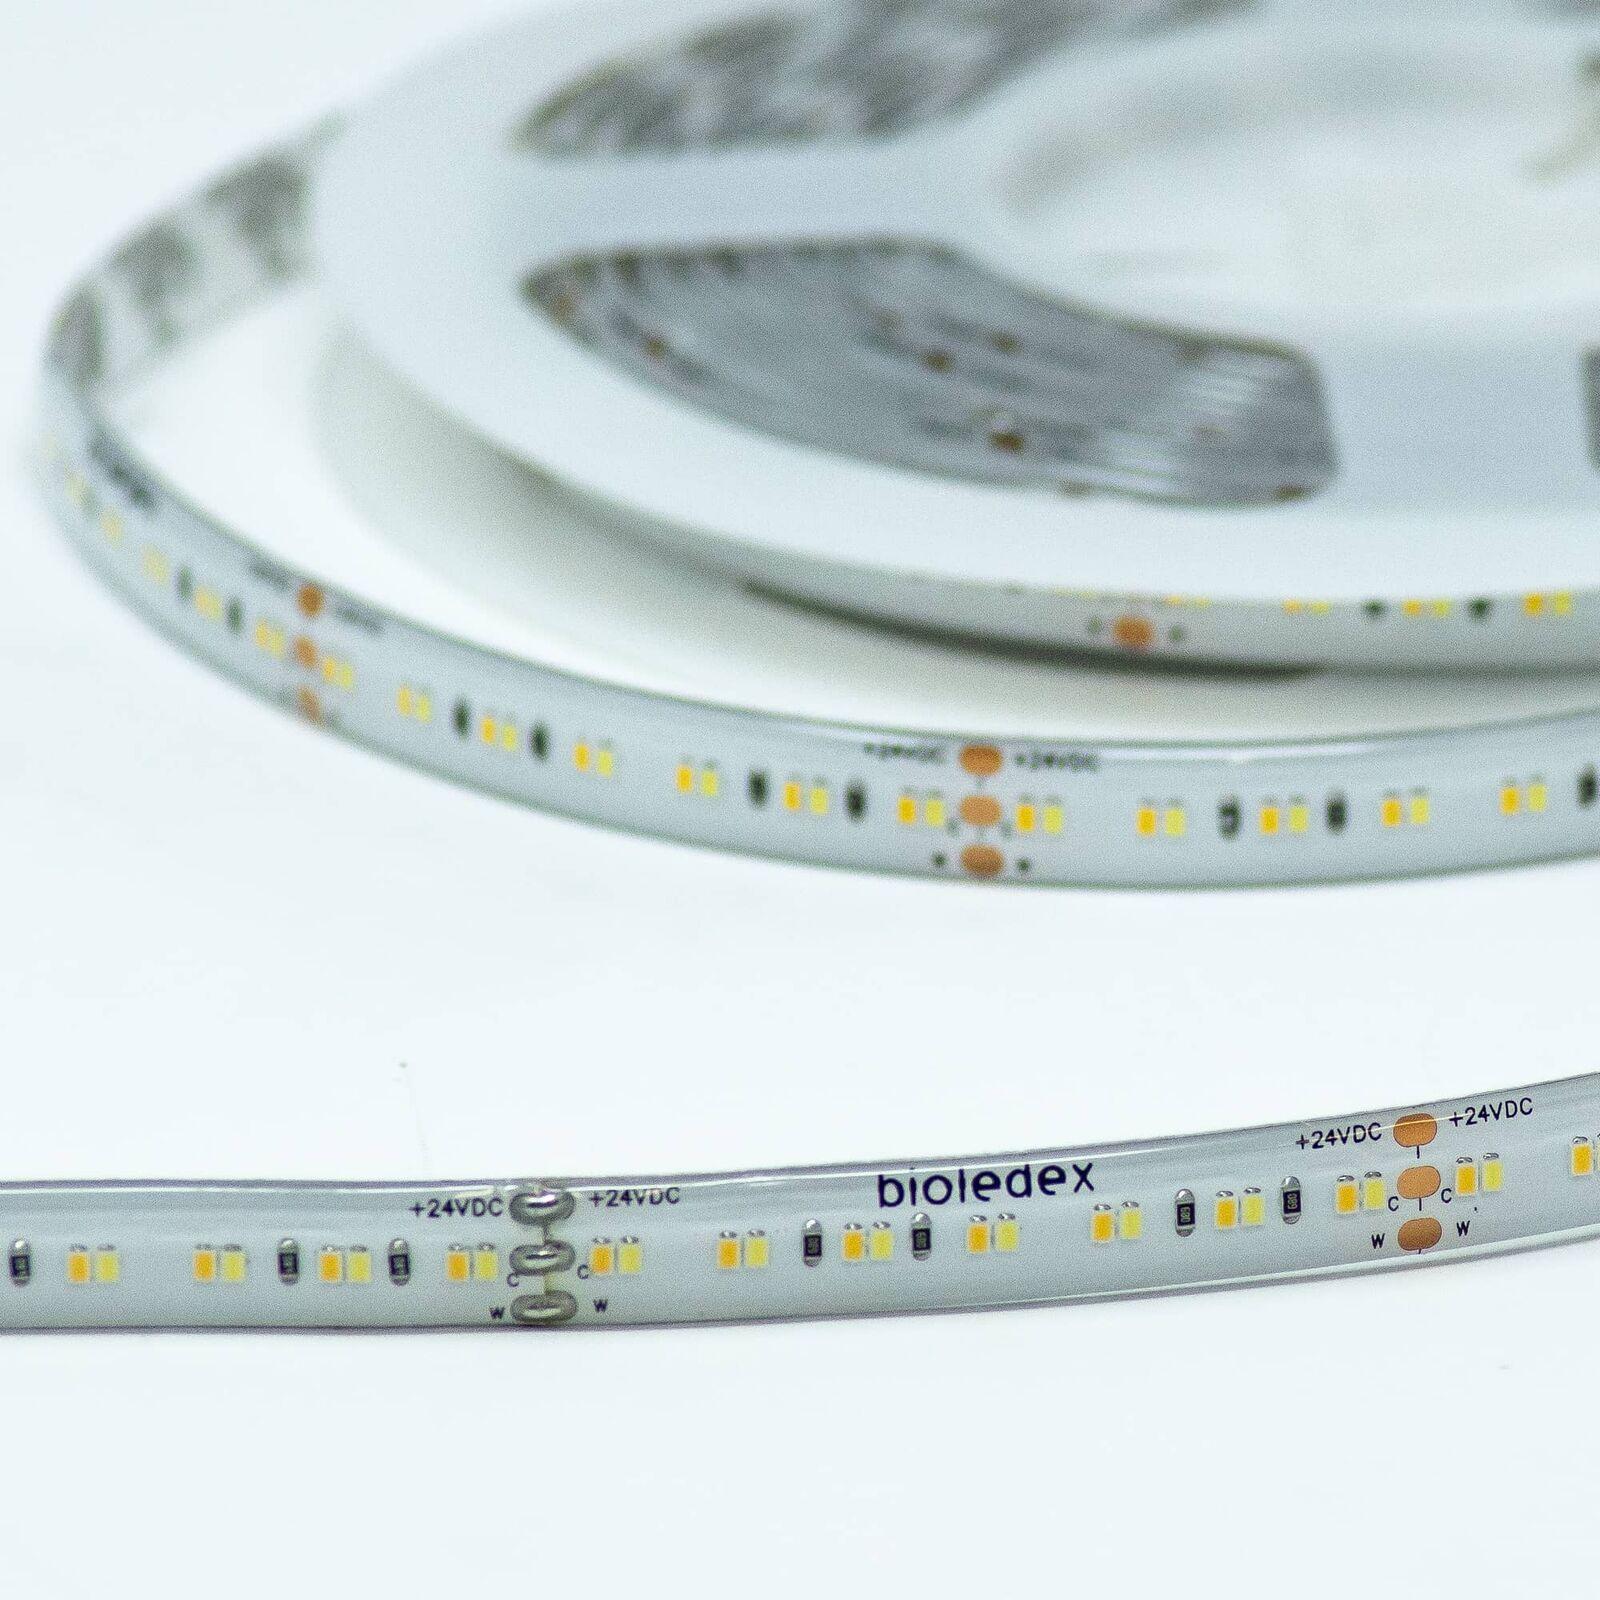 Bioledex LED Streifen 24V 90Ra 19,2W m 252LED m 2700-6500K IP65 5m Rolle tunable